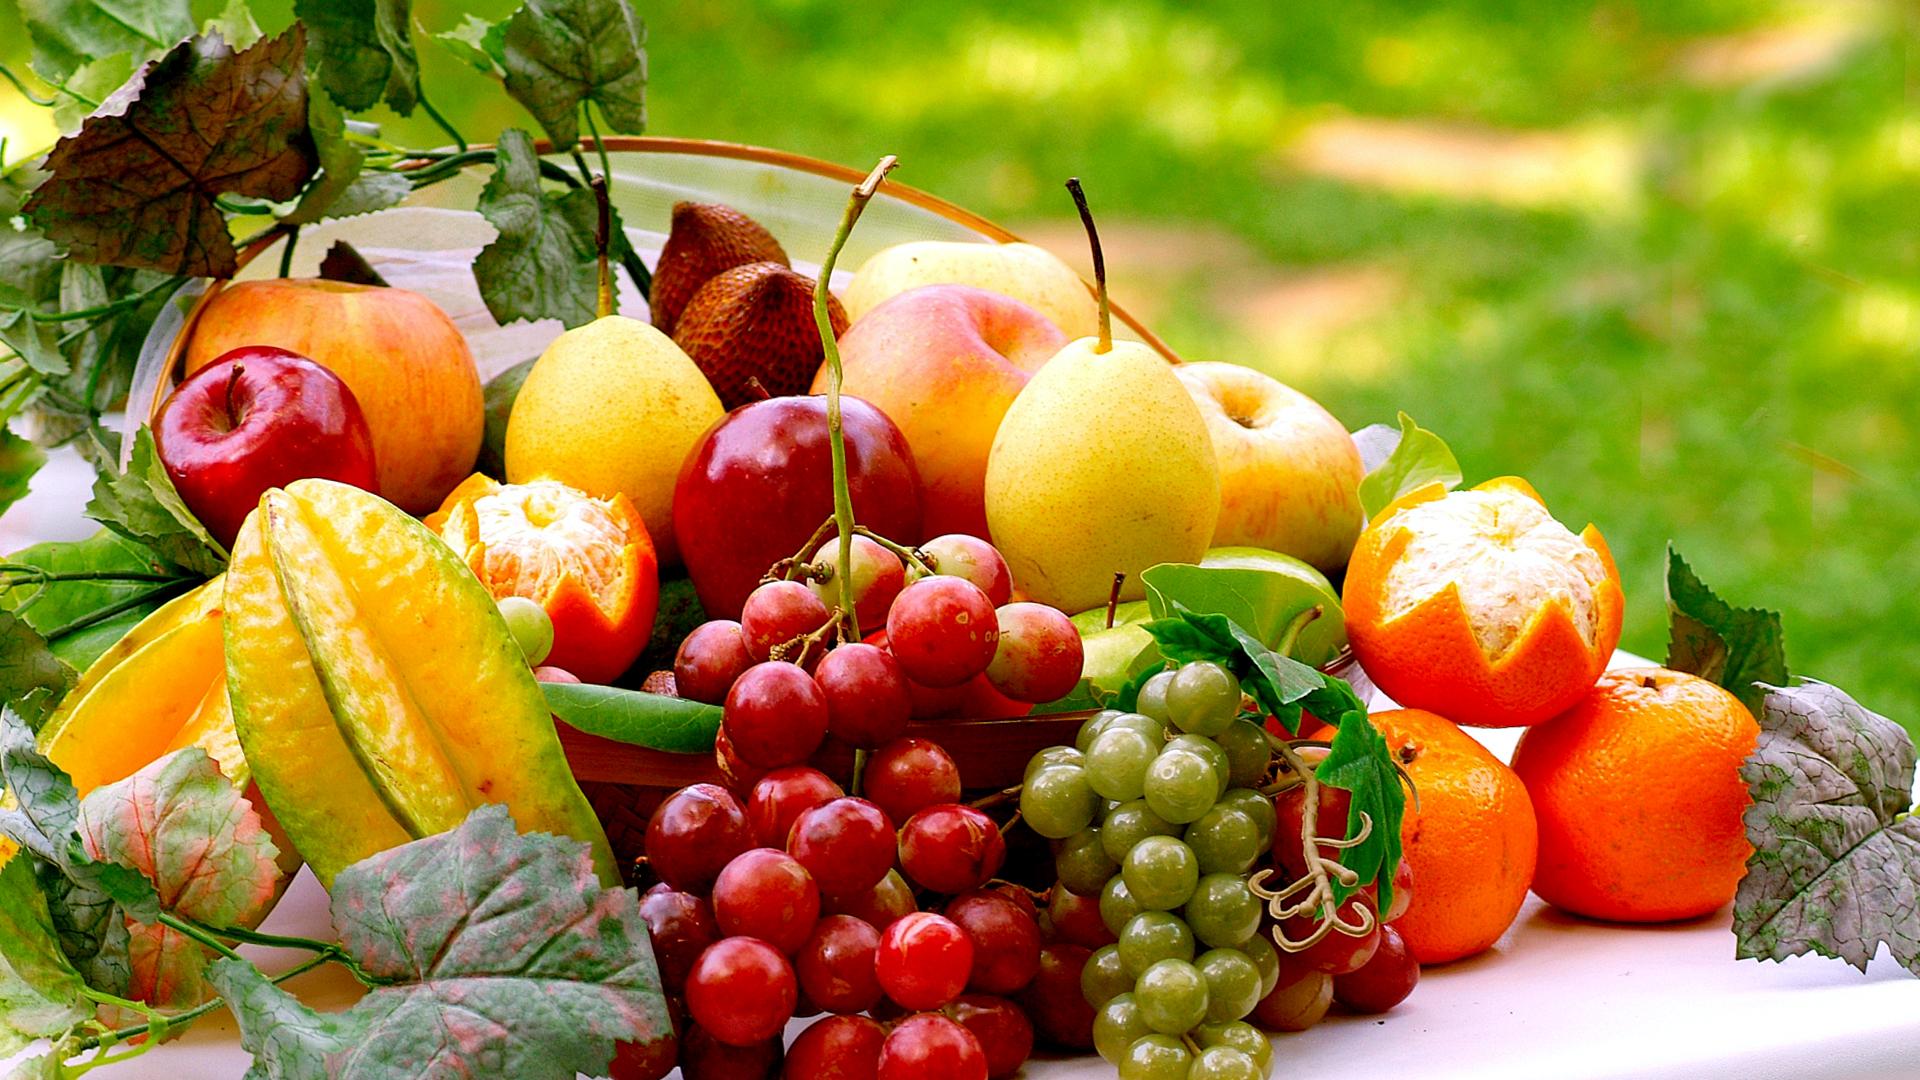 Fruits_Salad_High_Resolution